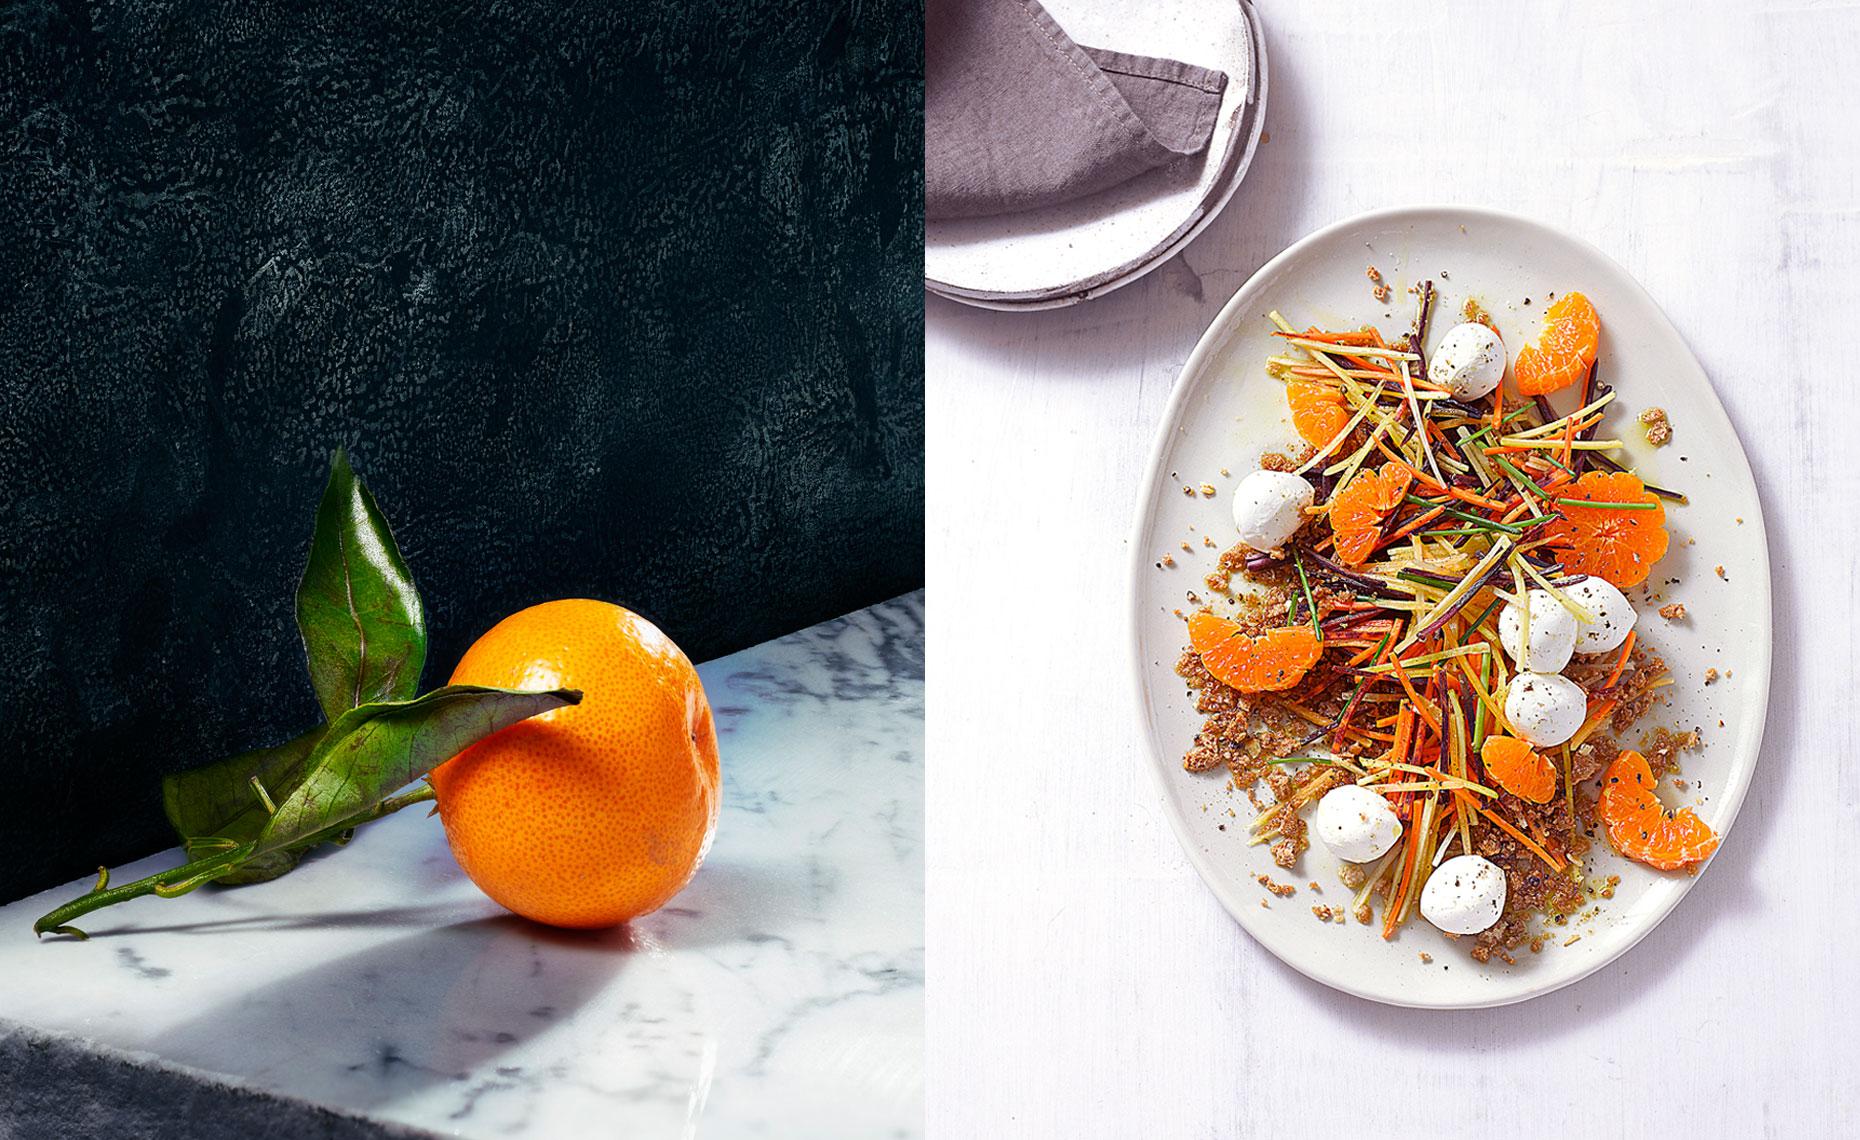 orange-and-orange-salad.jpg